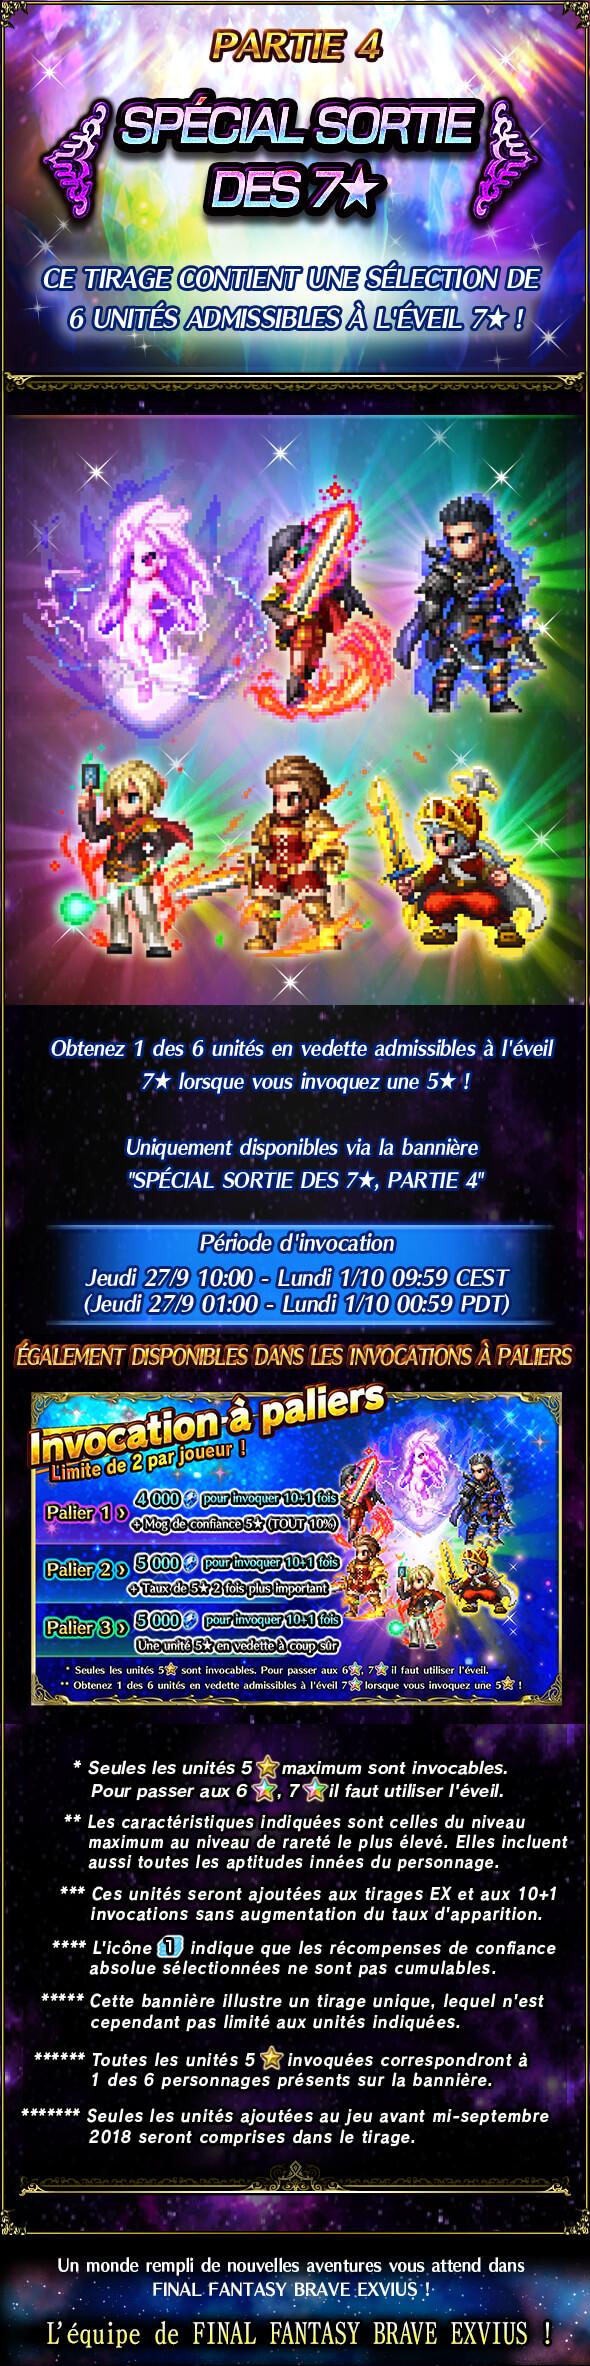 Invocations du moment - FFBE - Speciales sortie des 7* (lot 2) 7starfeaturepart4_NEWS_Compilation